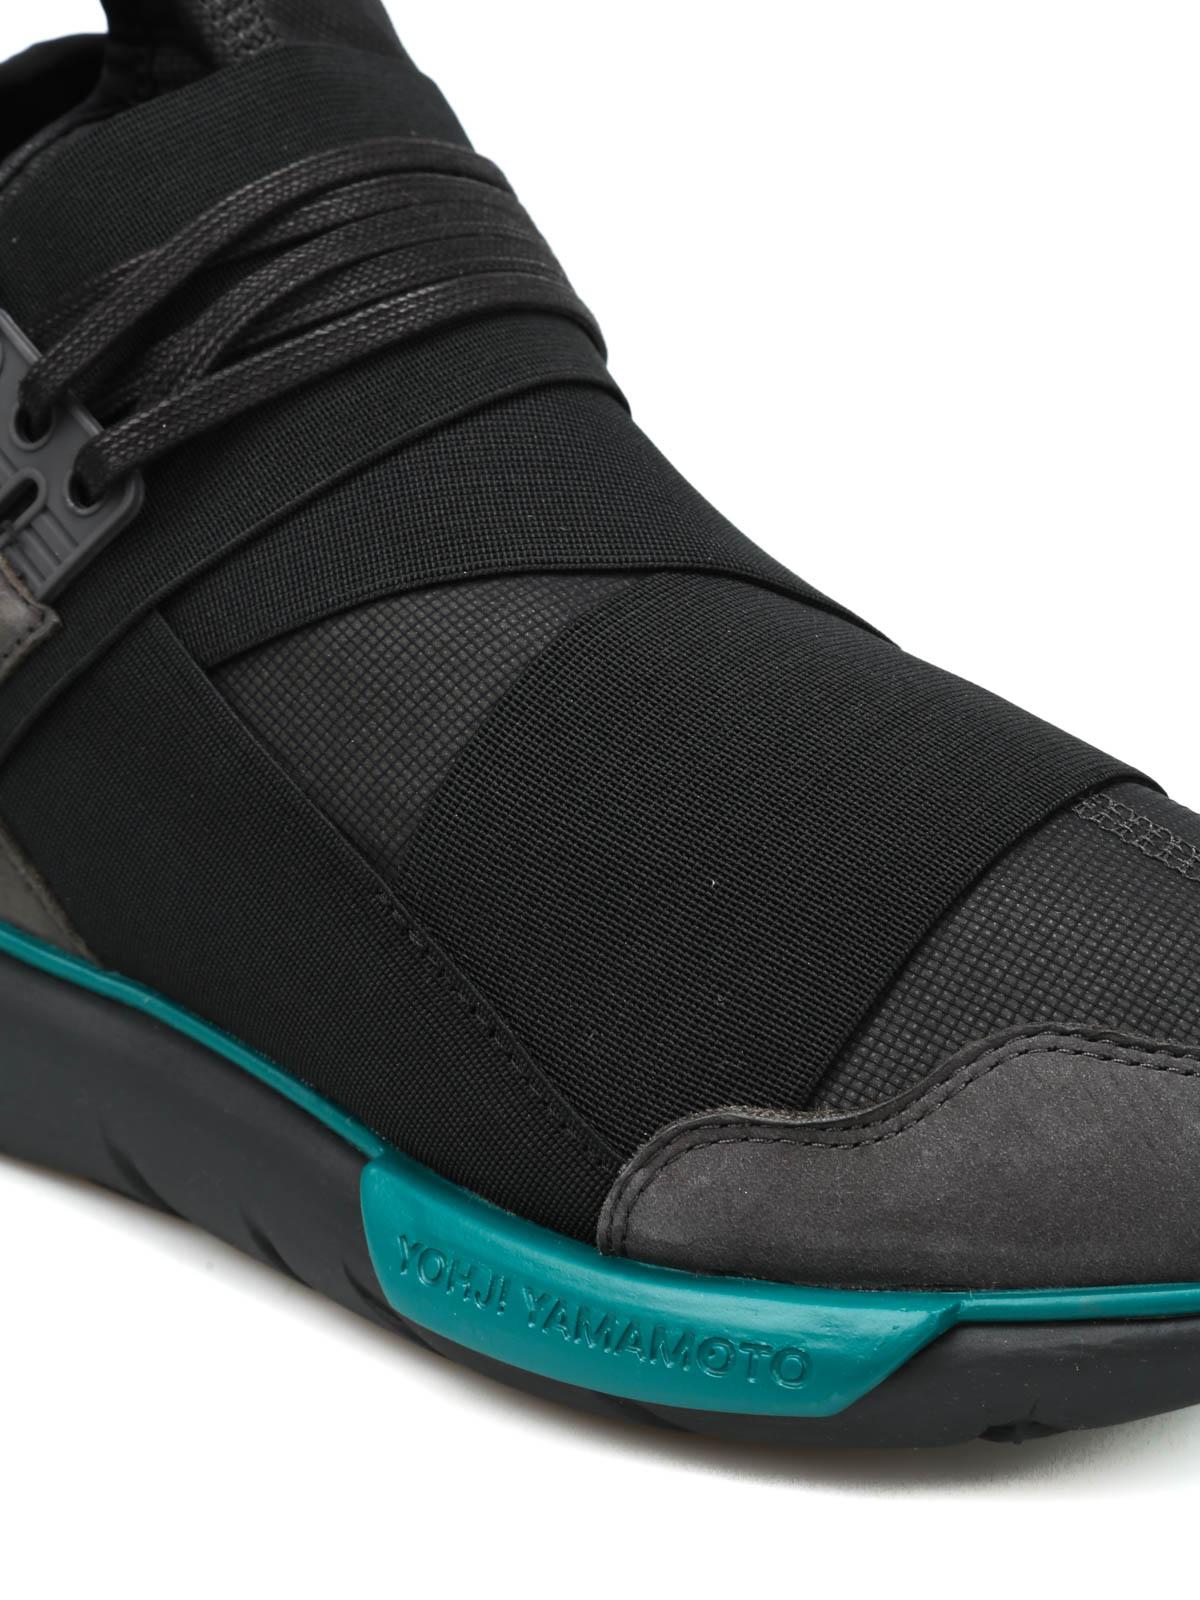 8aa2242273e7b Adidas Y-3 - Qasa High slip-on sneakers - Sneaker - BB4735